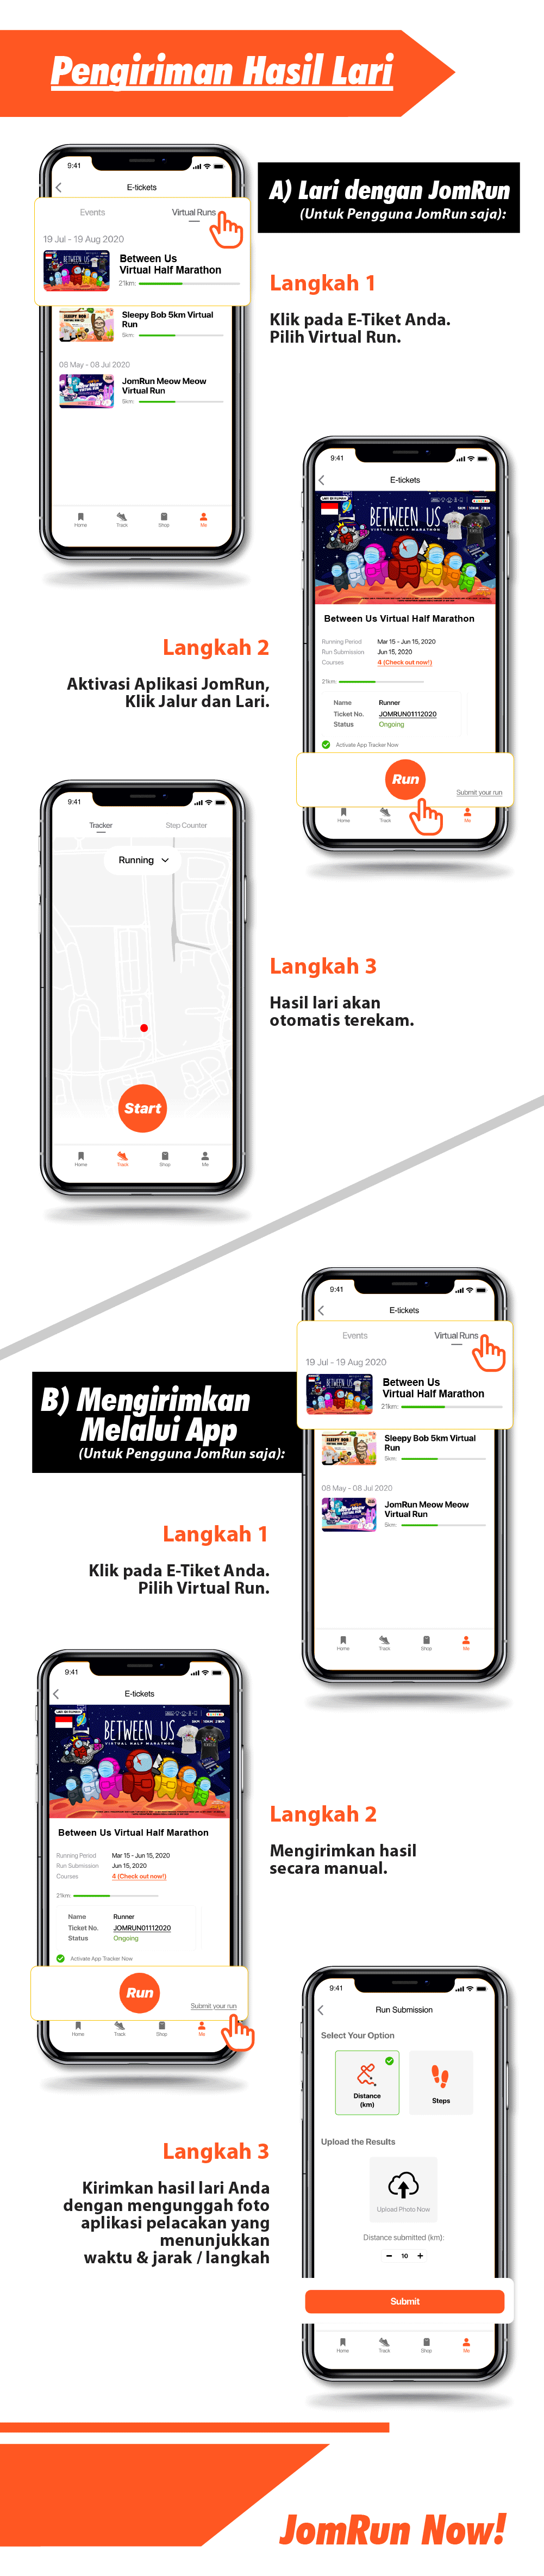 Merry Christmas Virtual Half Marathon - Indonesia